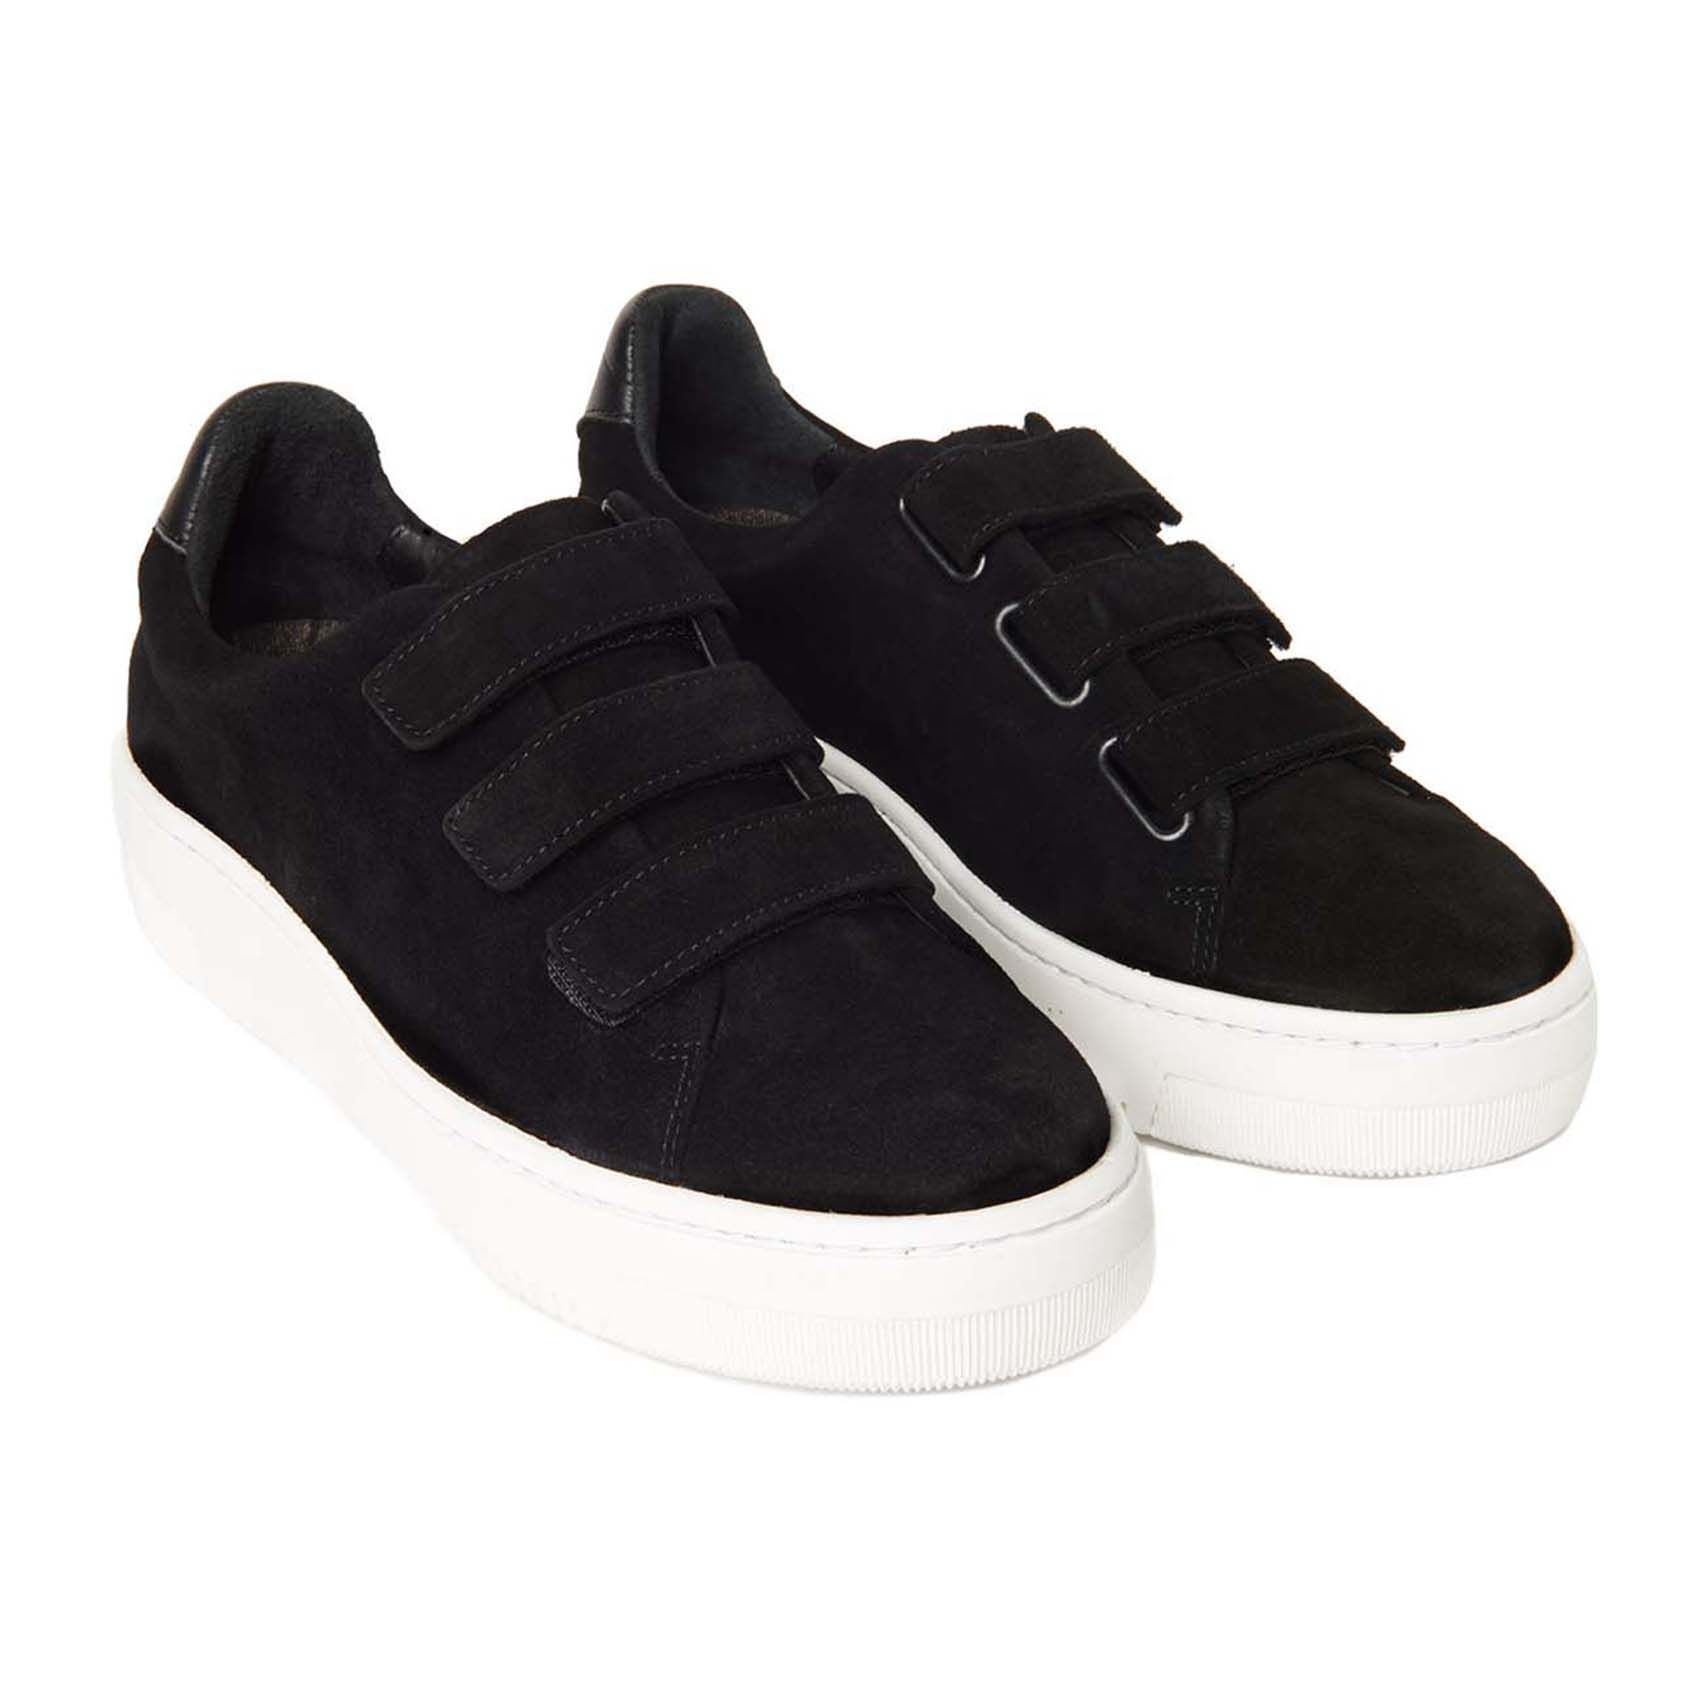 chaussure femme sandro,Site Officiel Femme Baskets En Cuir